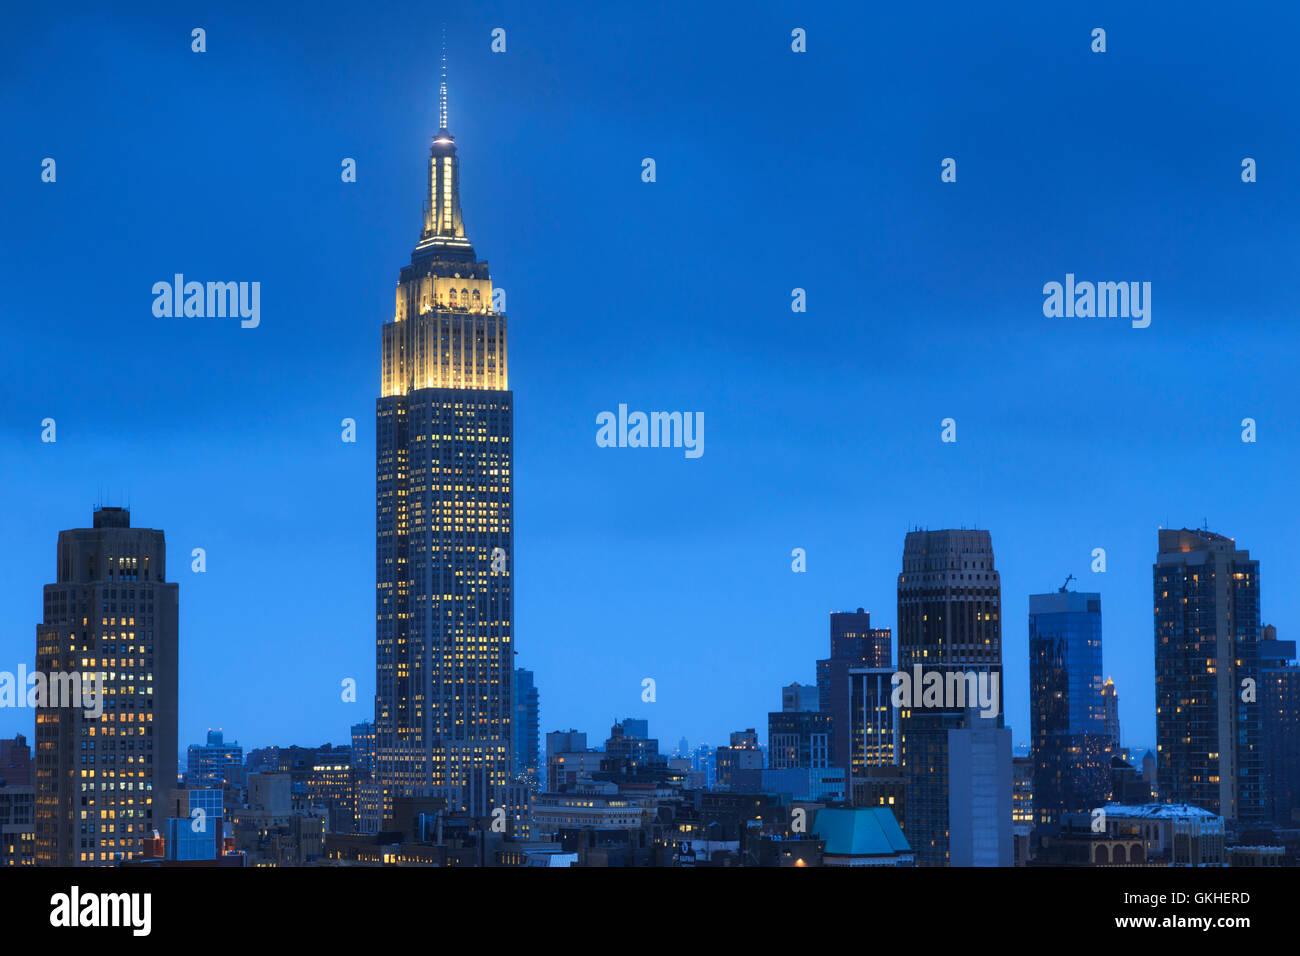 USA, New York, New York, Manhattan, Empire State Building Photo Stock